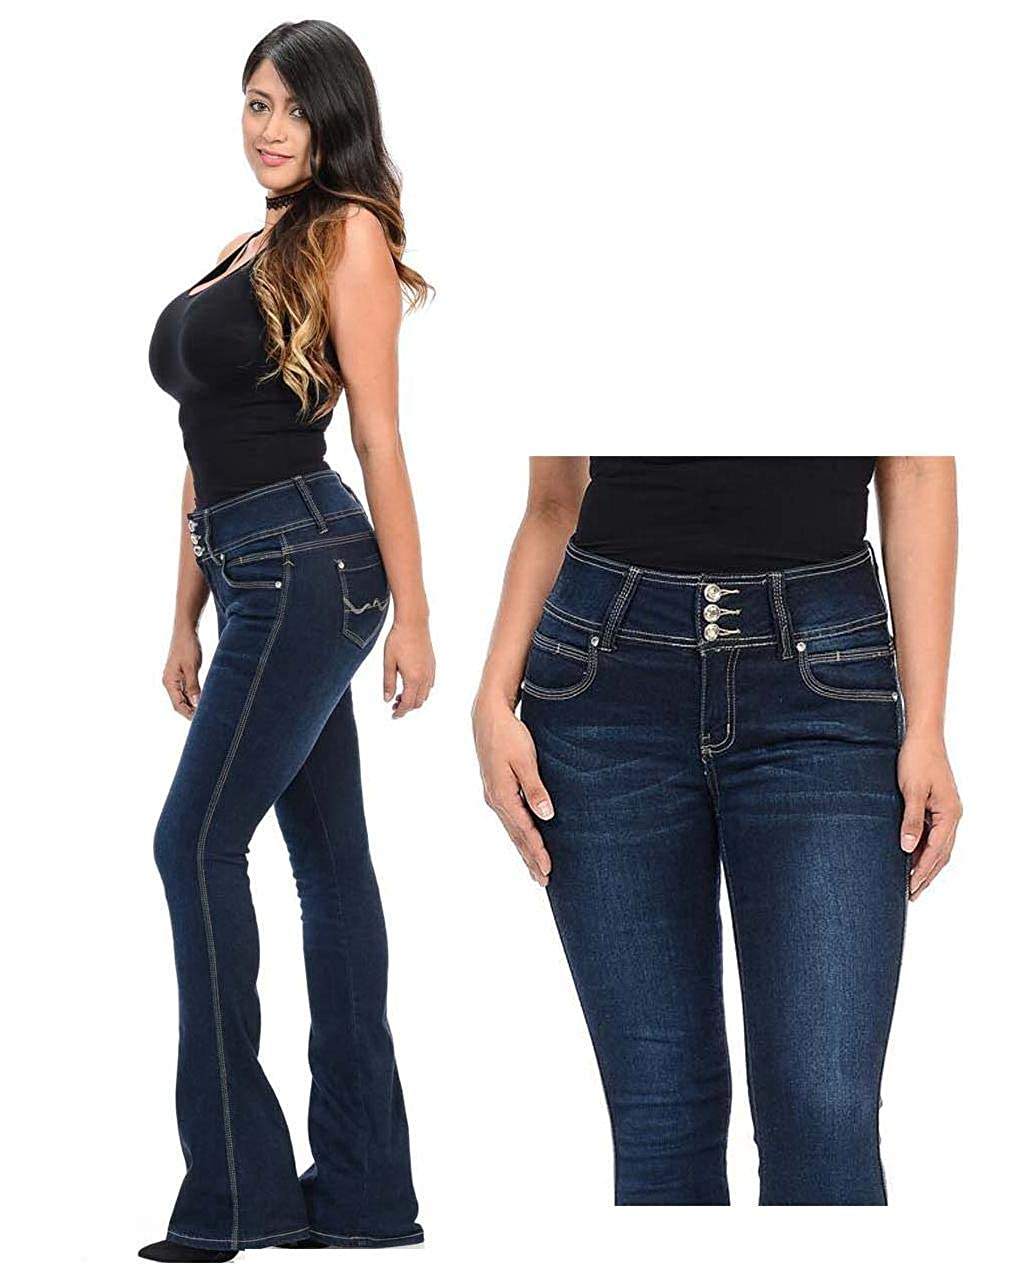 ad0b15975a3 Women s Juniors 70s Trendy Sexy Asymmetric Tassel Slit Flare Fitted High  Waist Bell Bottom Denim Jeans at Amazon Women s Jeans store